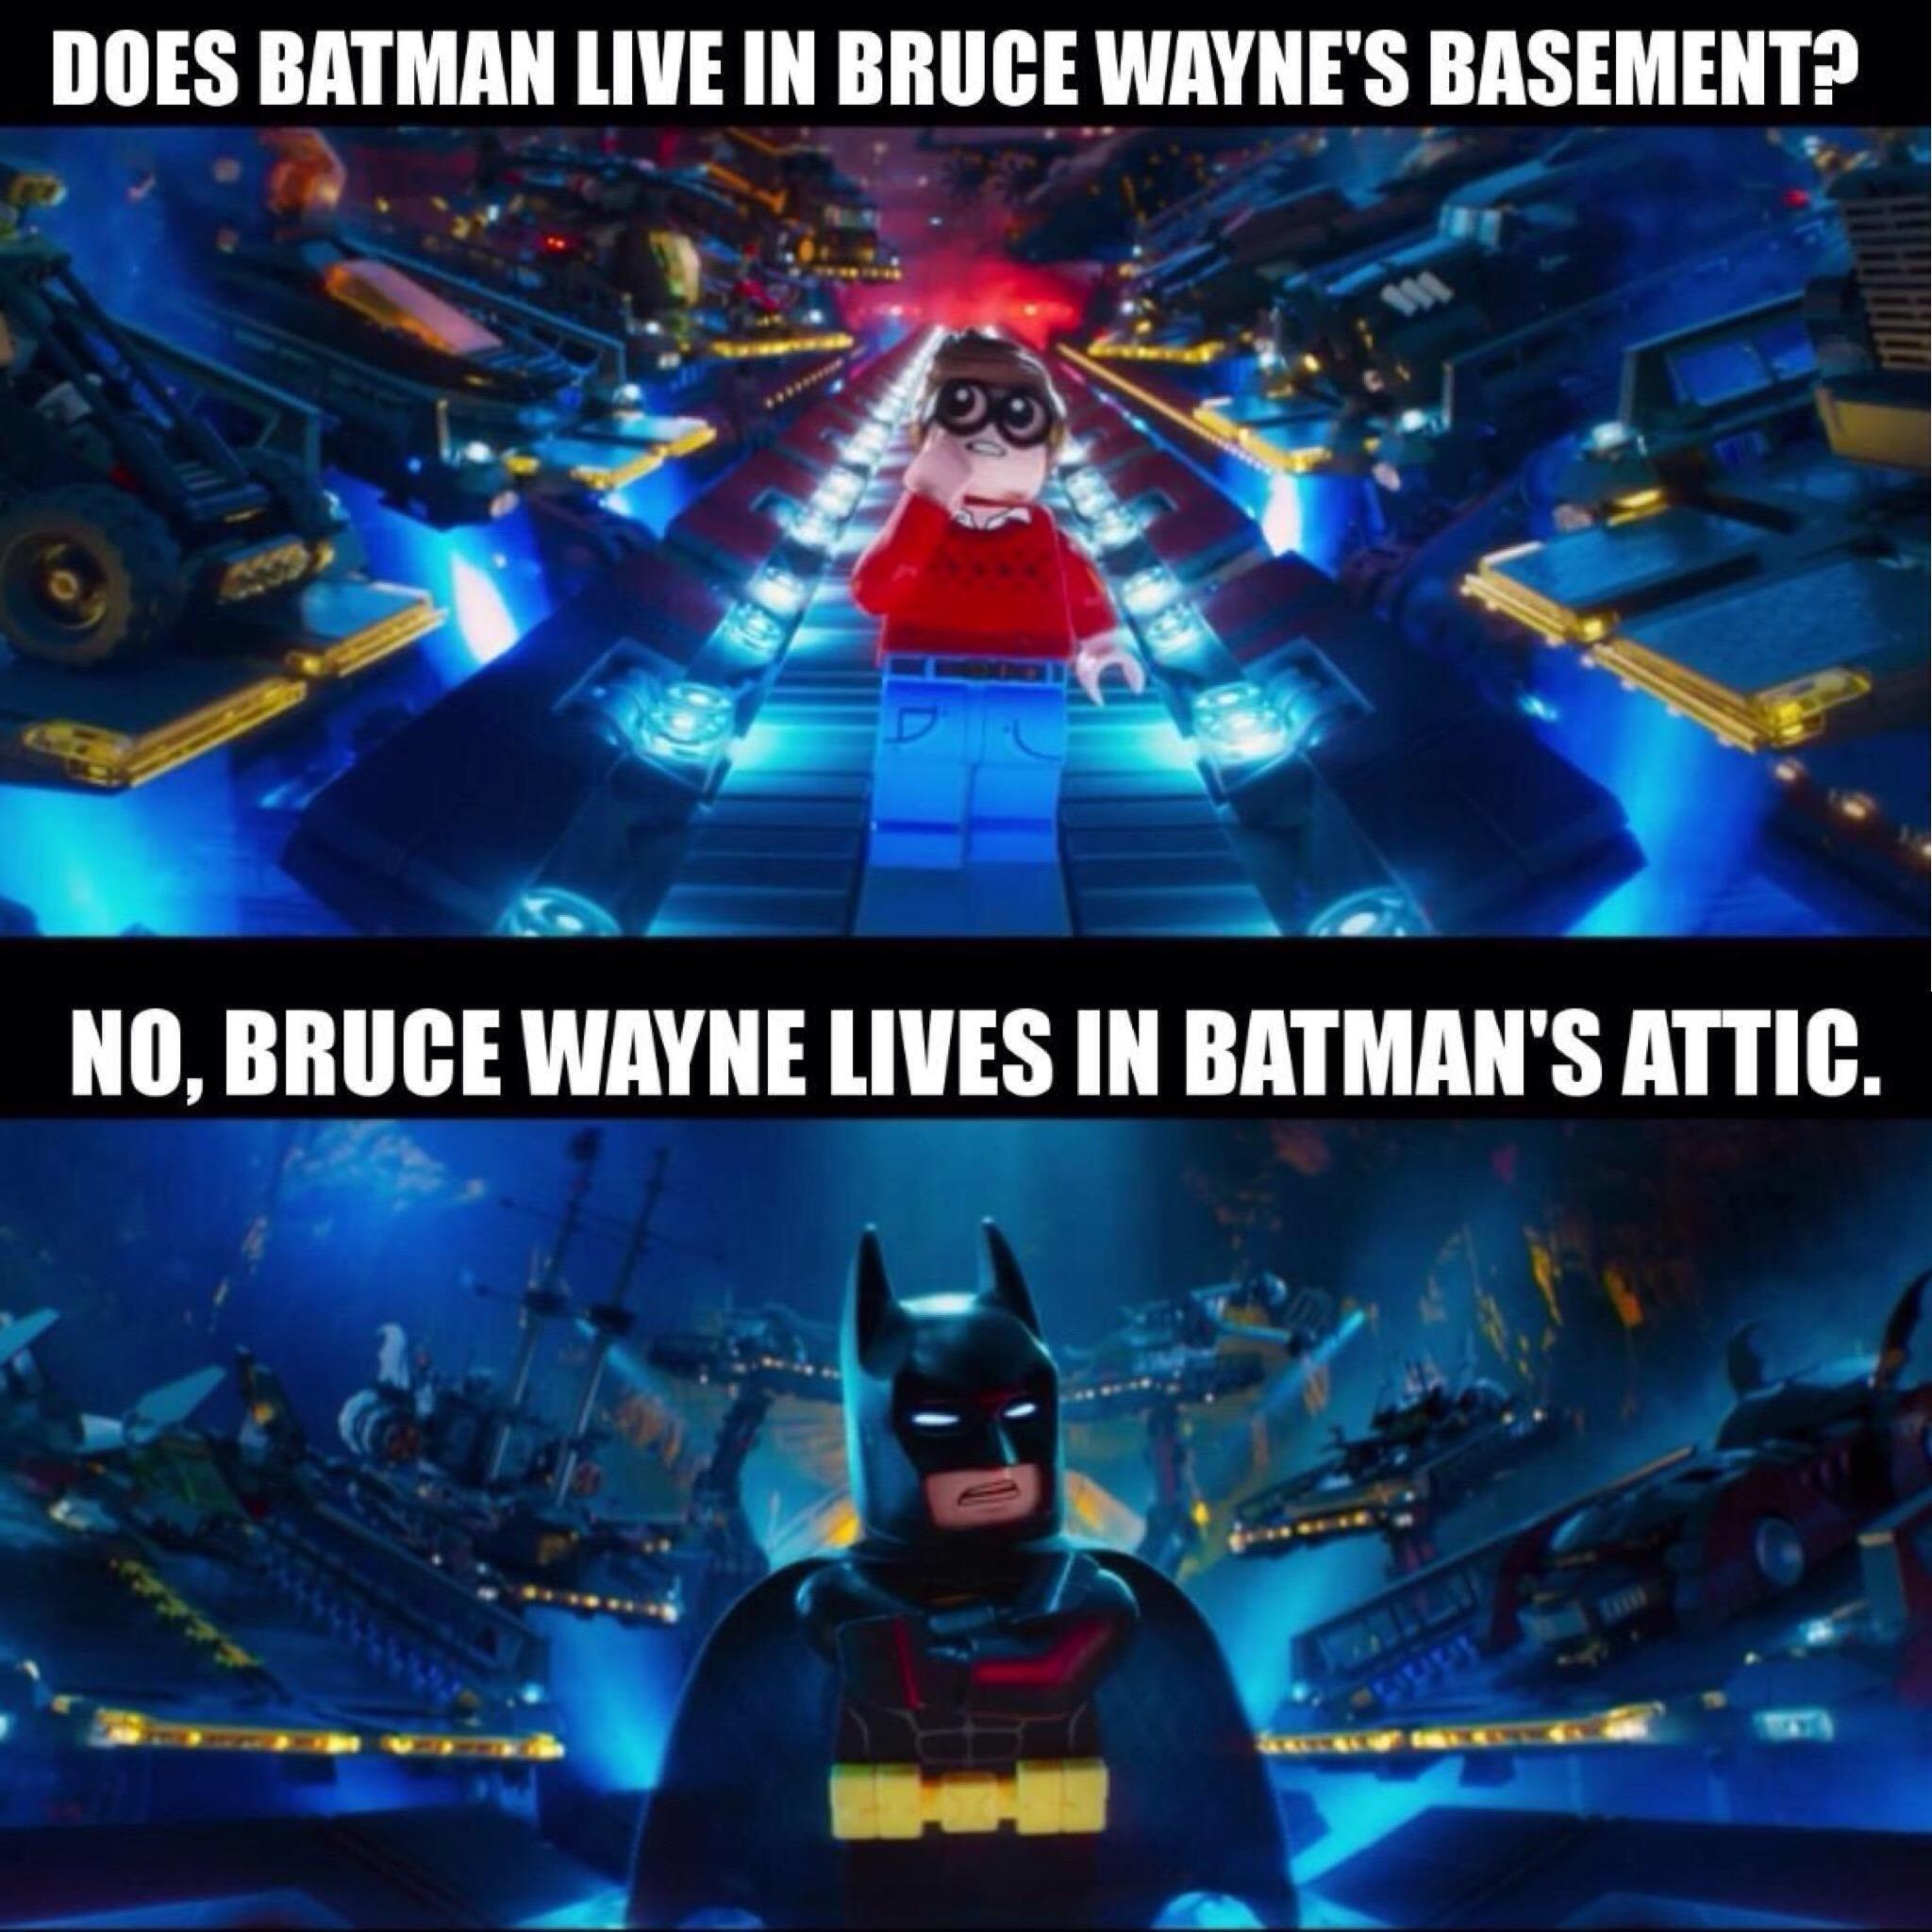 Pin By Stephanie Reid On Funny Stuff Batman Funny Lego Batman Movie Batman Movie